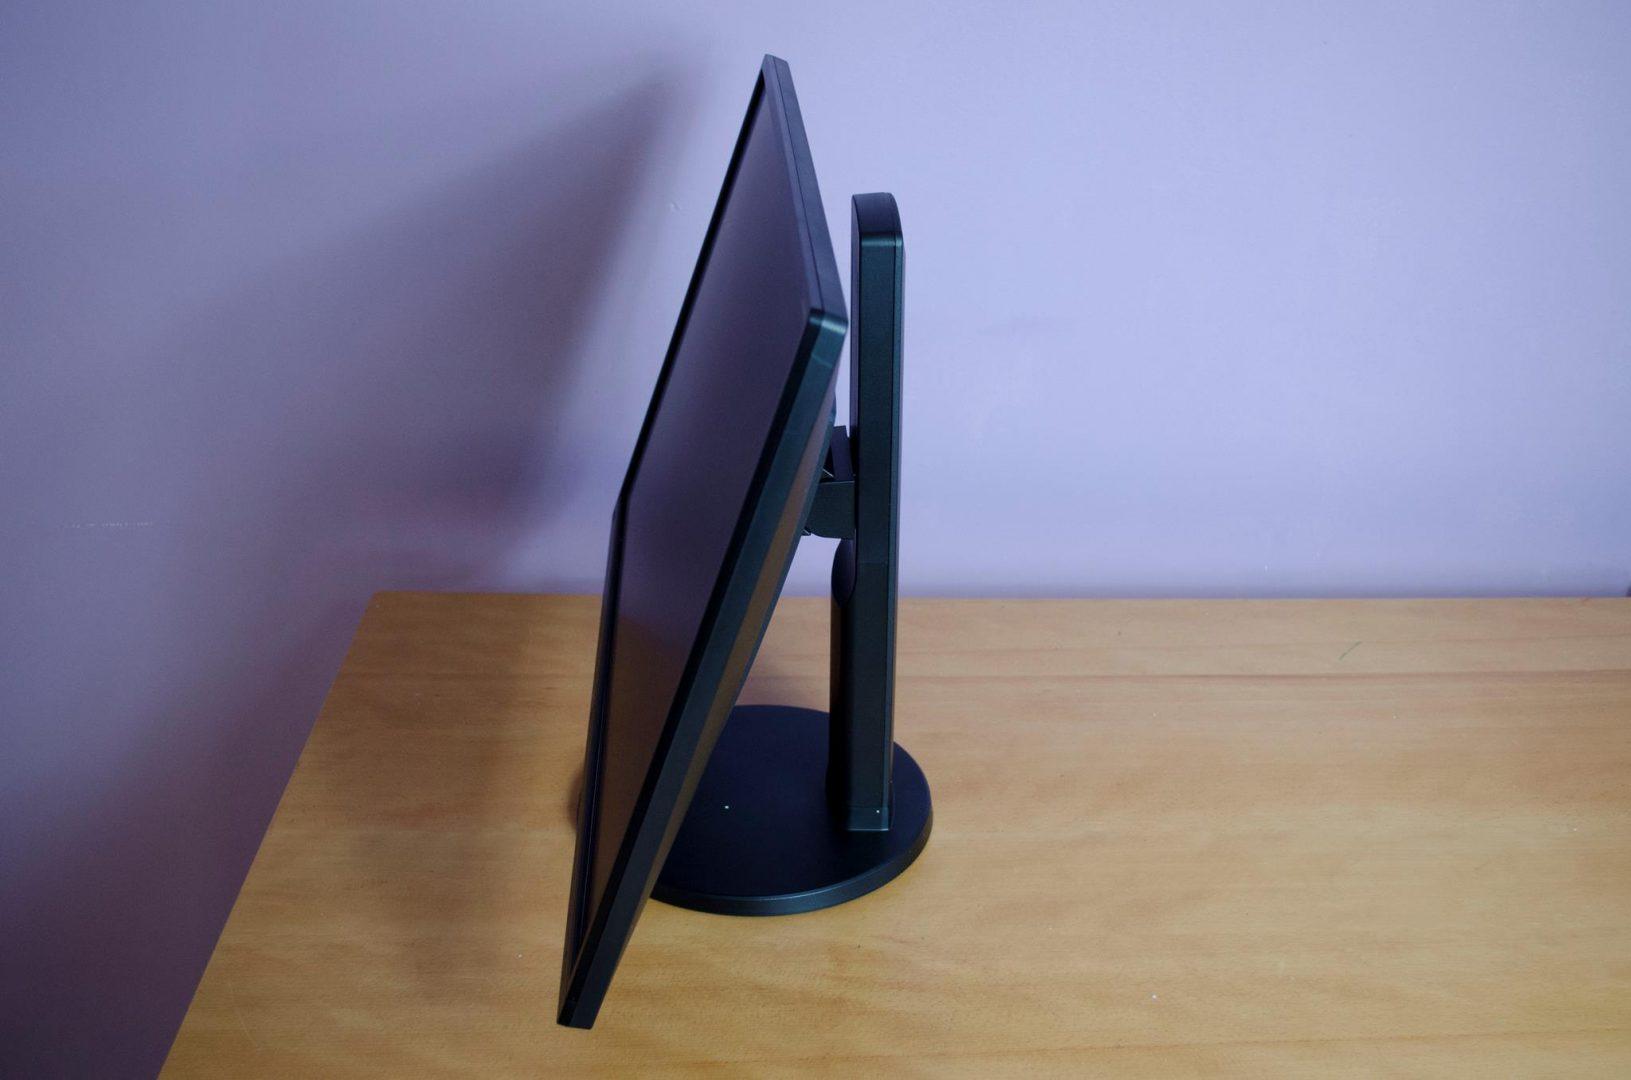 BenQ GL2706PQ Monitor Review - EnosTech com